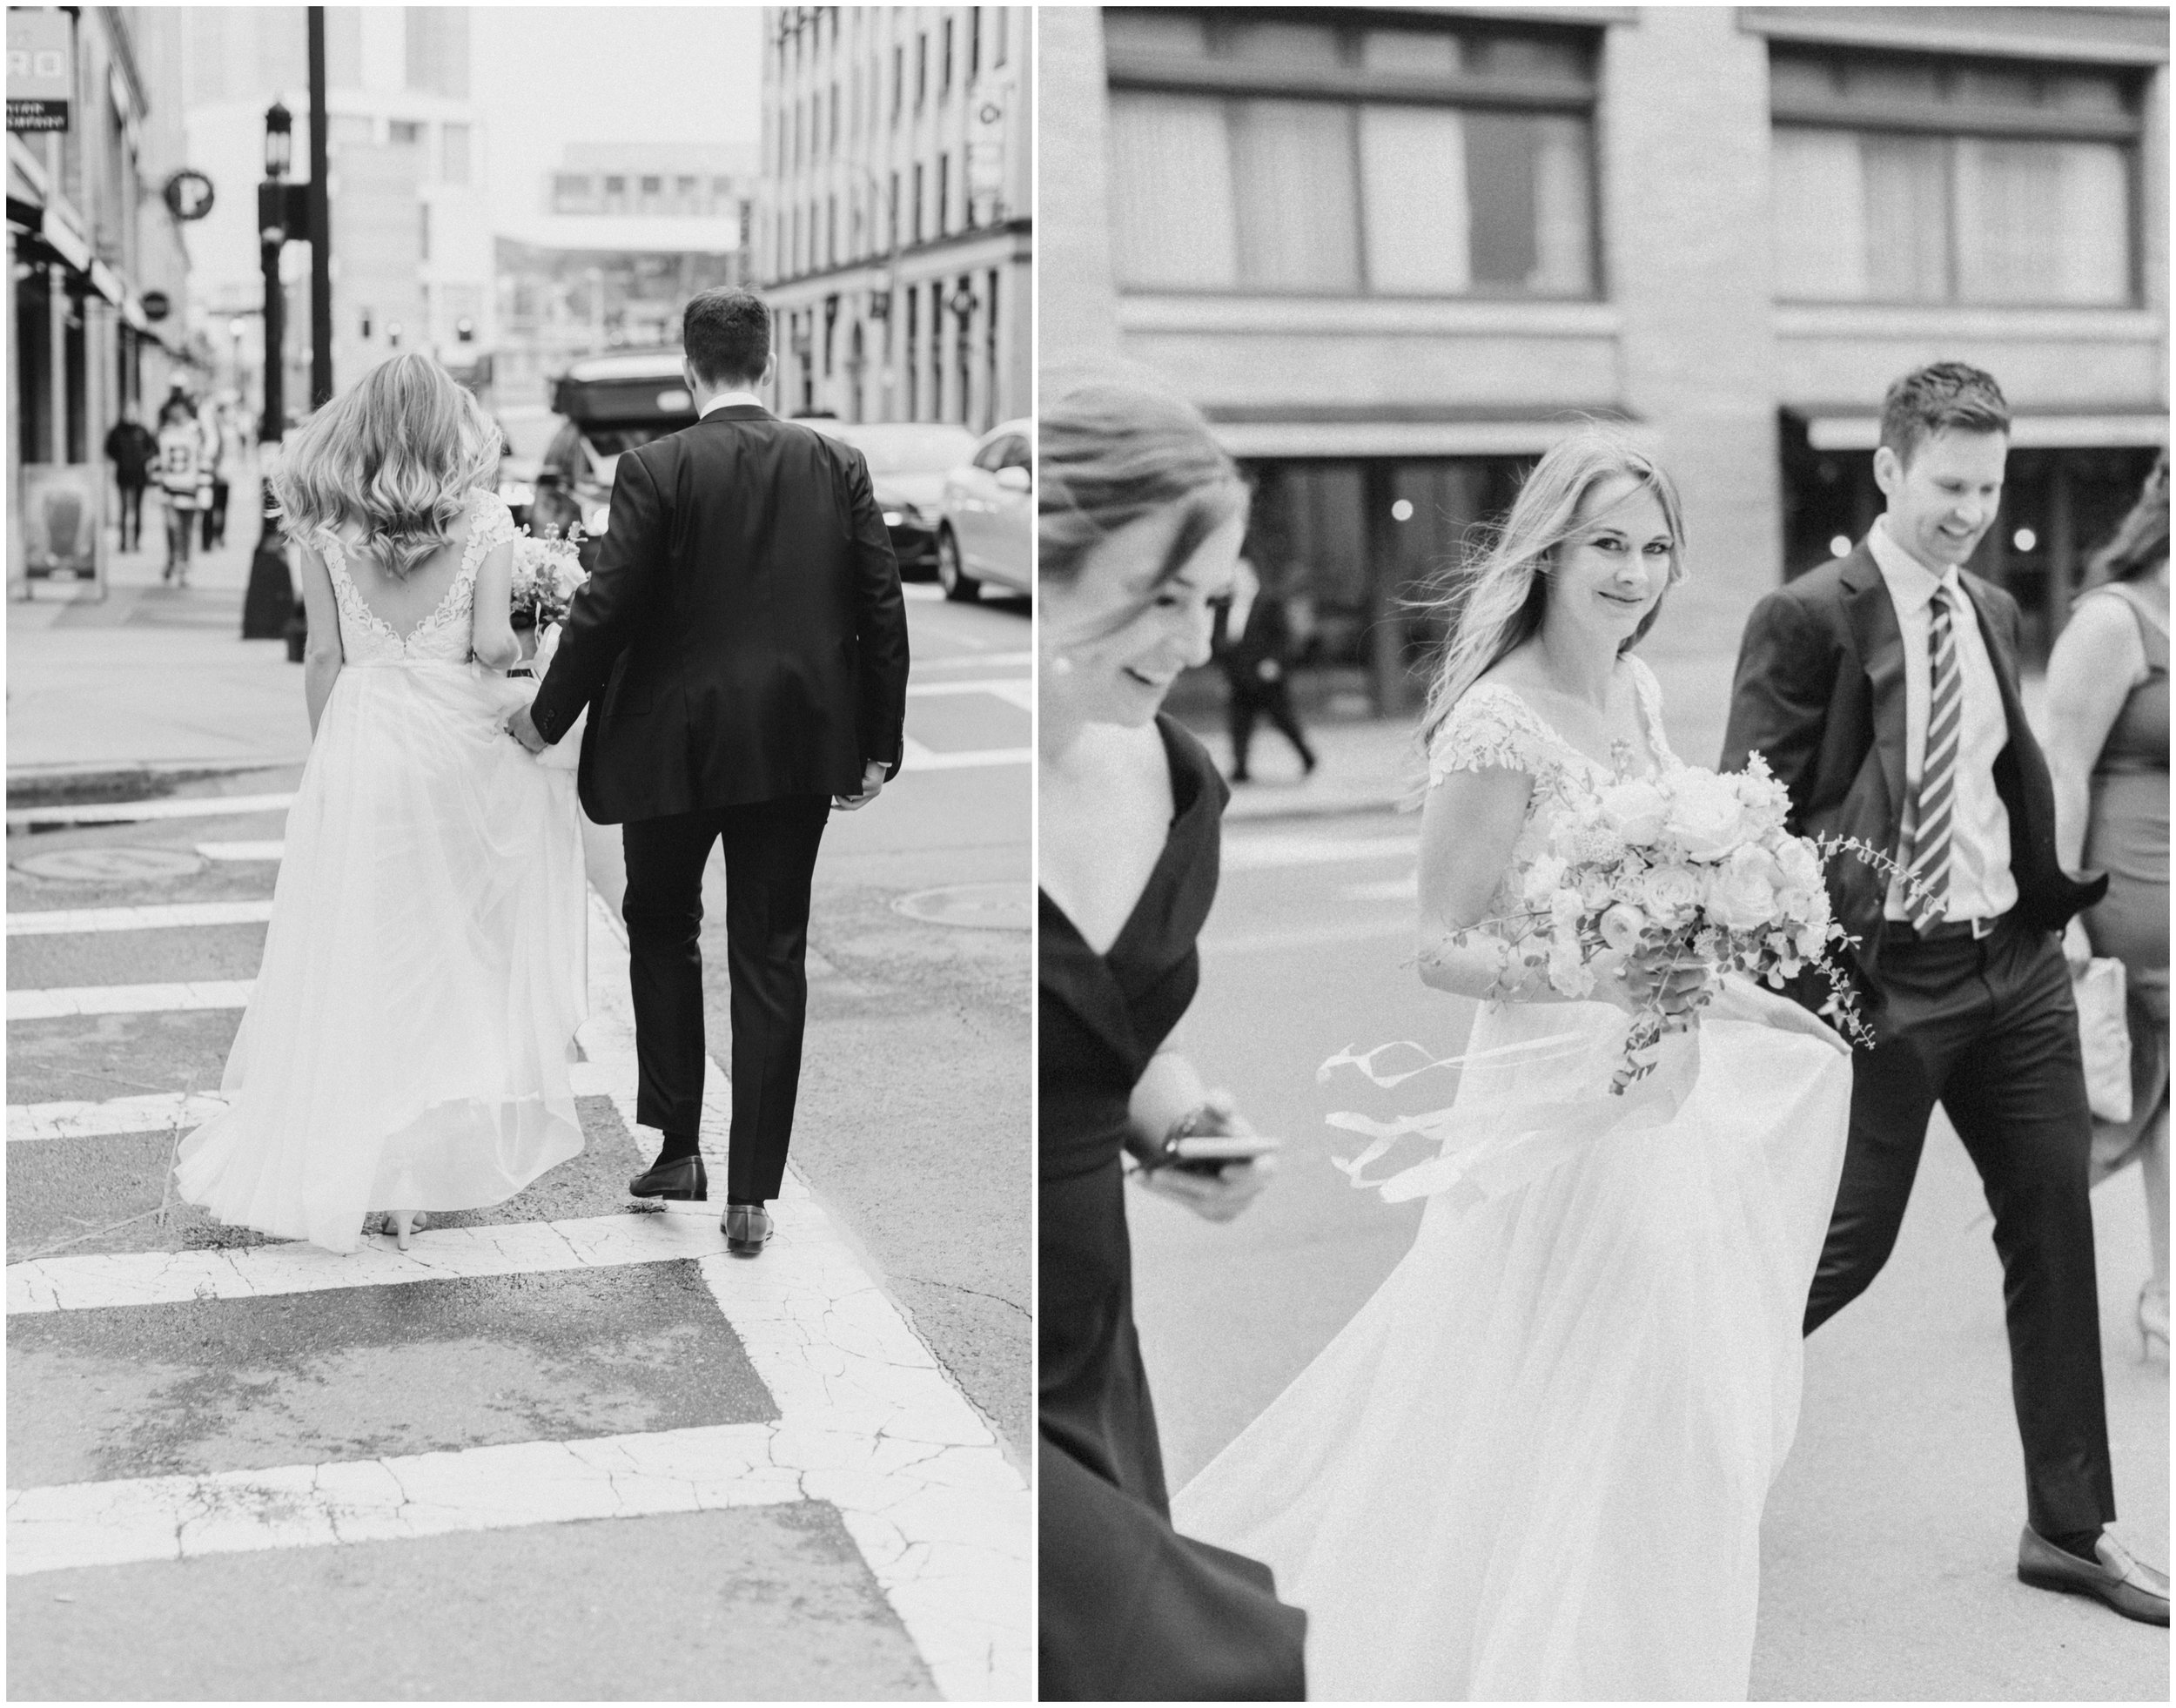 jay-robin-married-row-34-boston-26.jpg